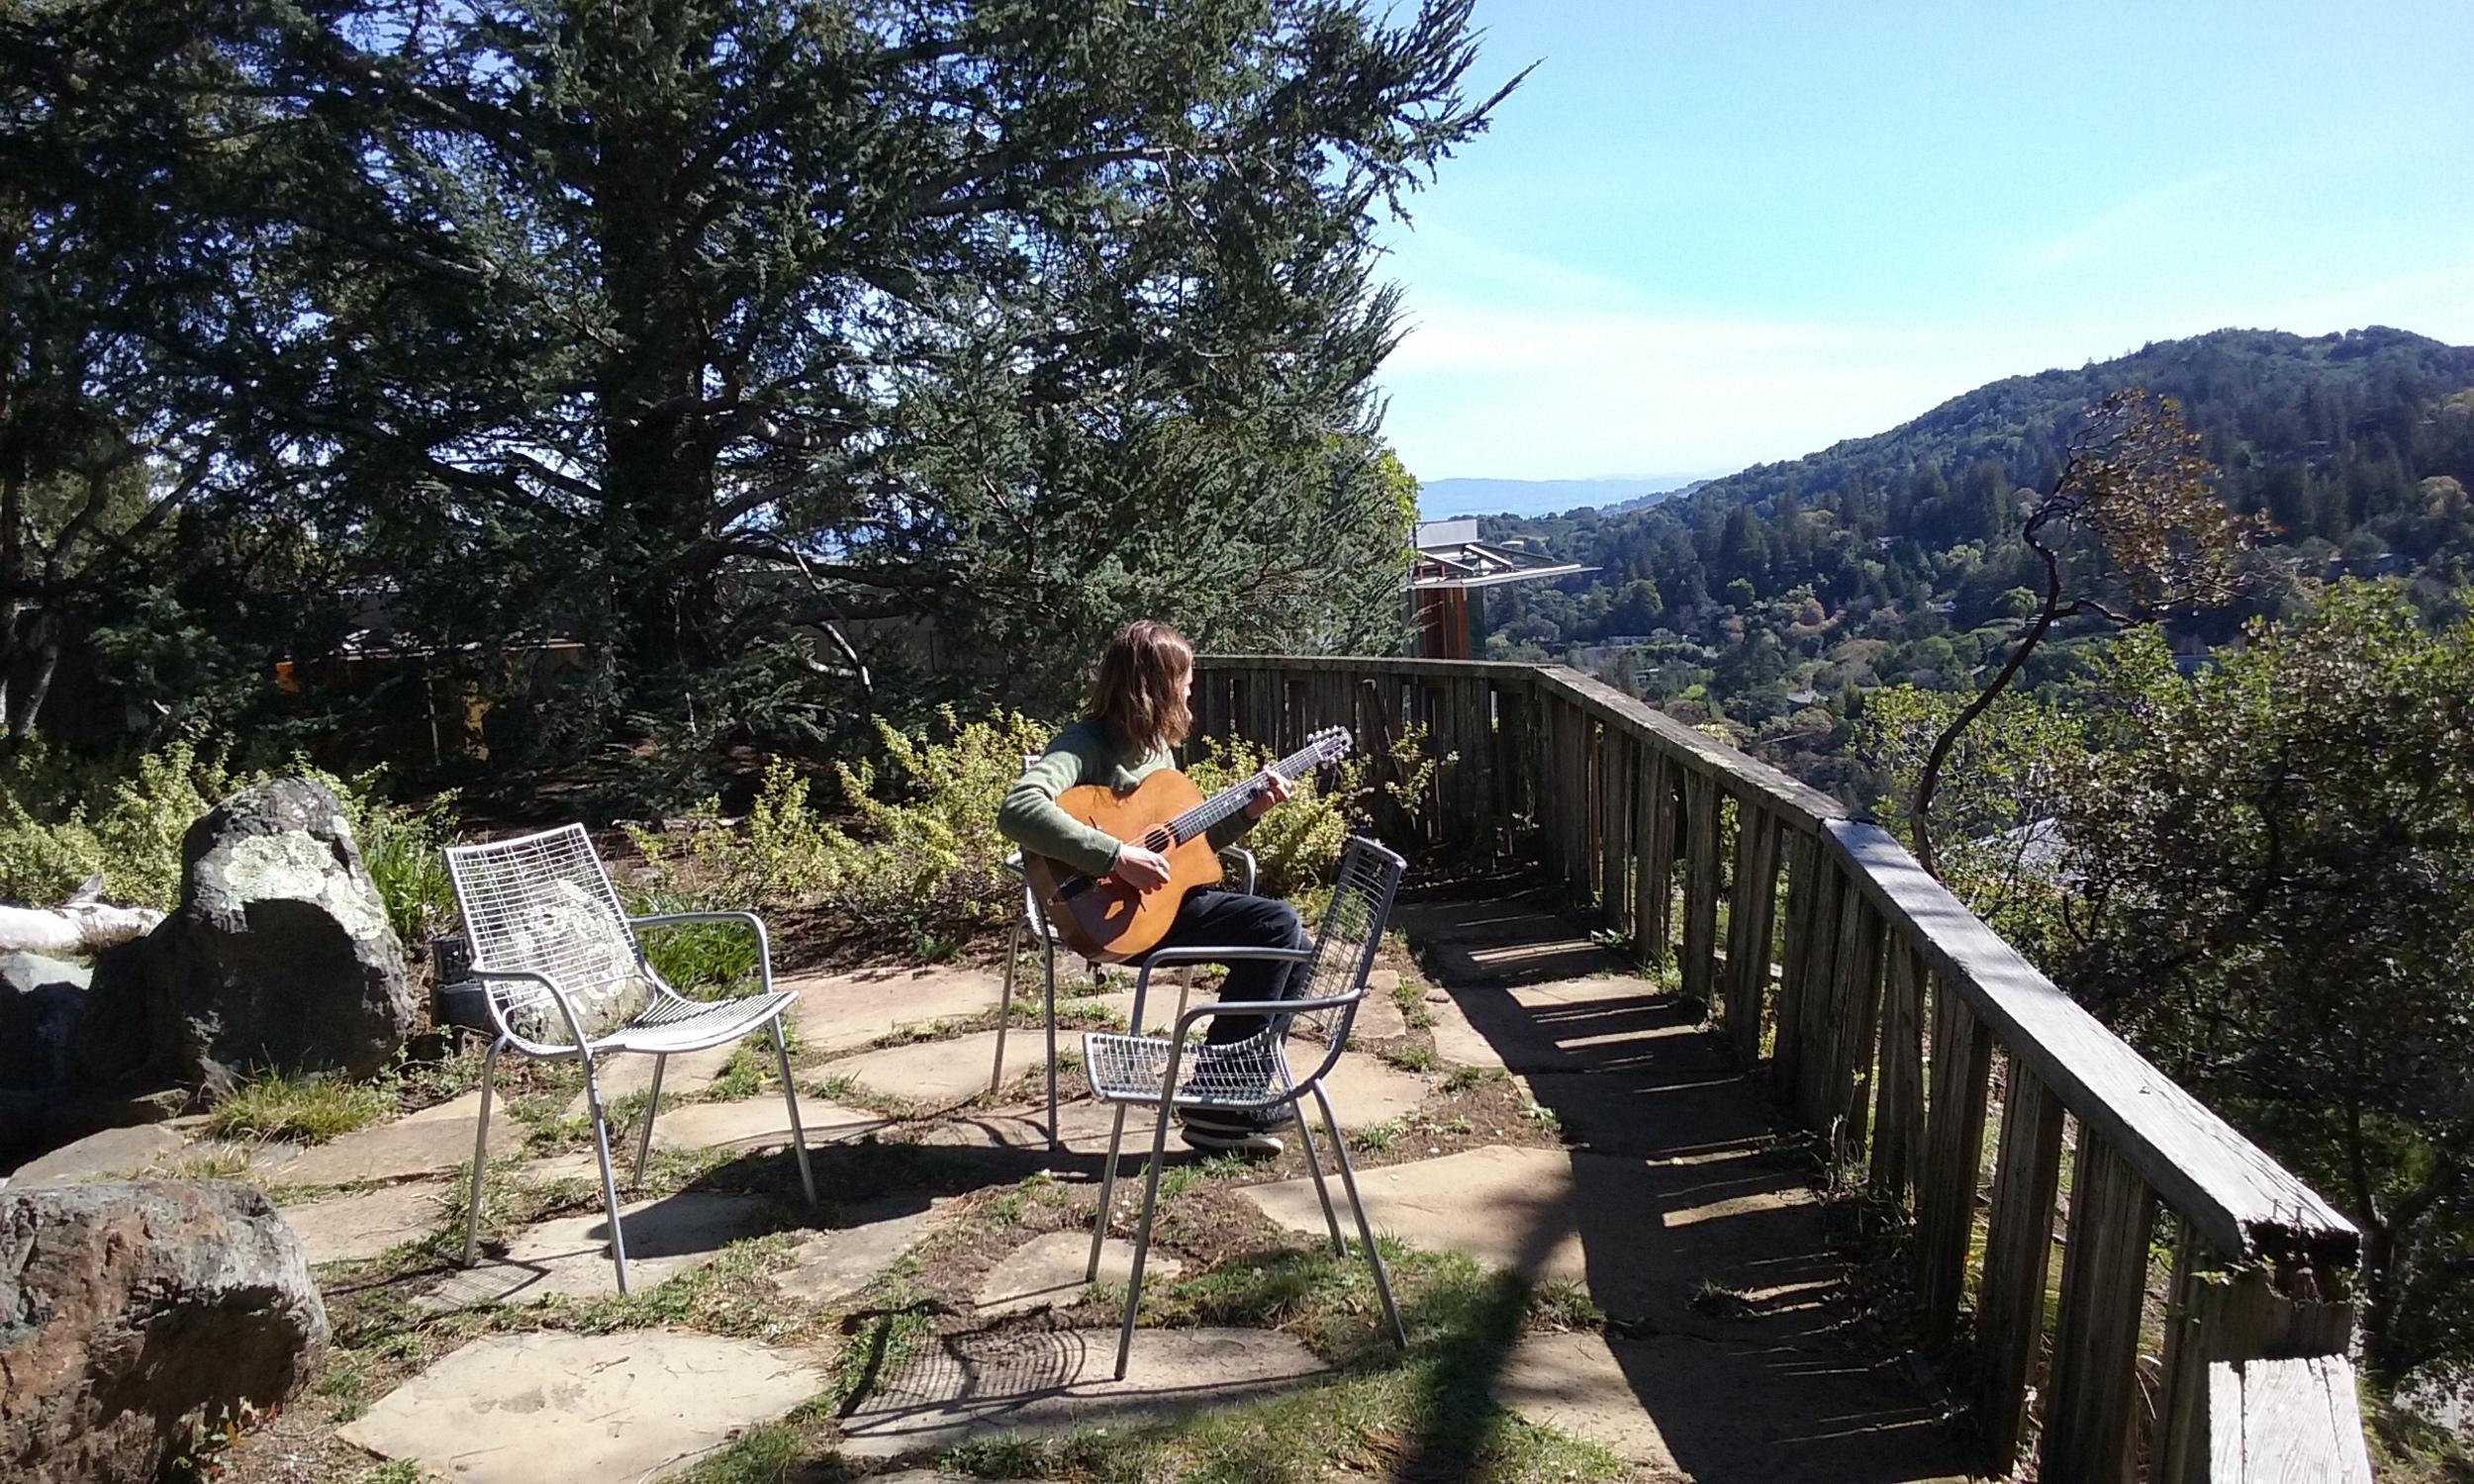 Javi Jimenez enjoying the view between takes